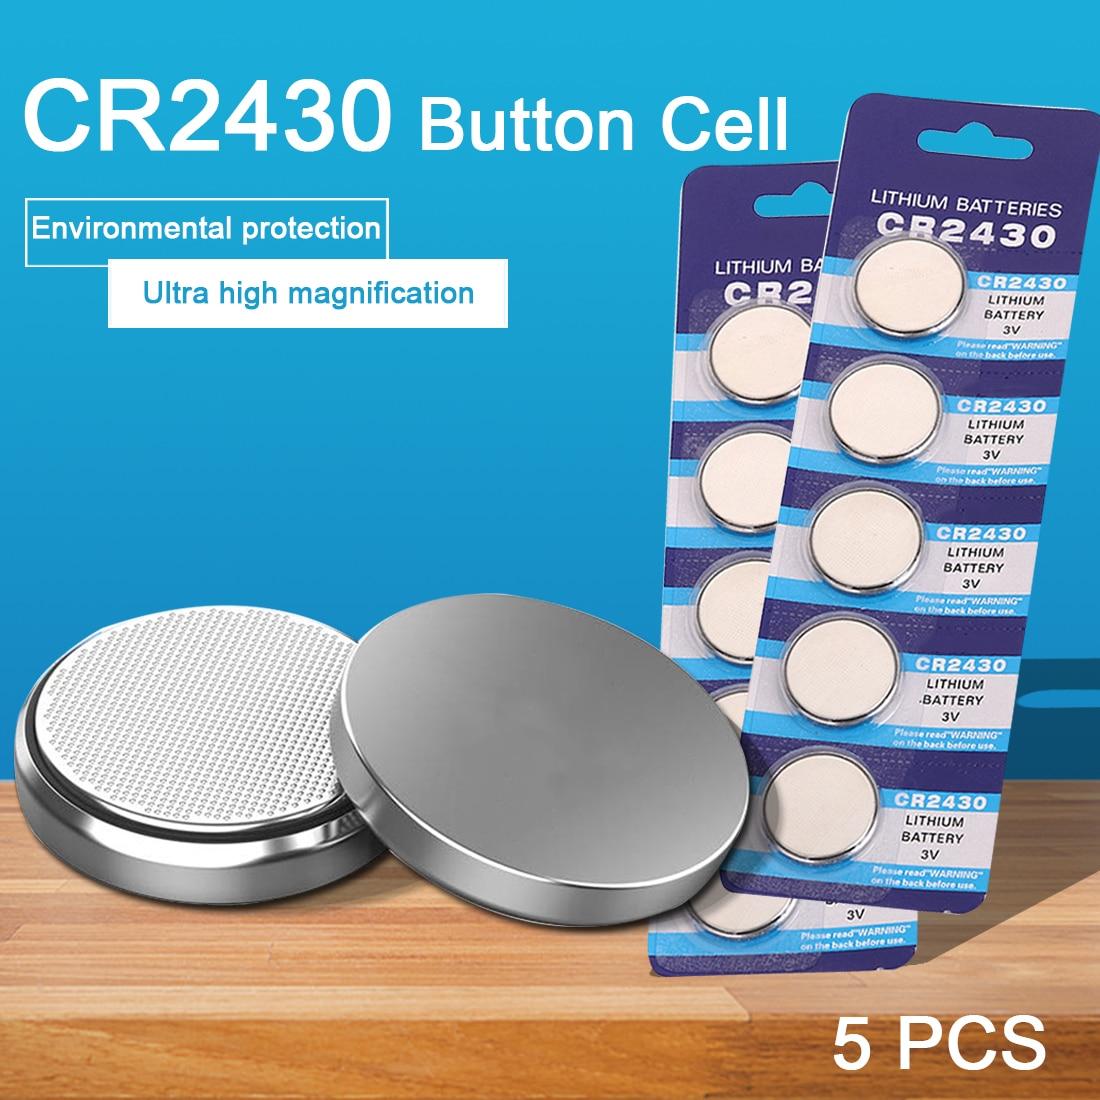 5 шт./упак. CR2430 часы Батарея Кнопка Батарея DL2430 BR2430 ECR2430 плоский круглый Аккумулятор Литиевые батареи для электронная игрушка часы